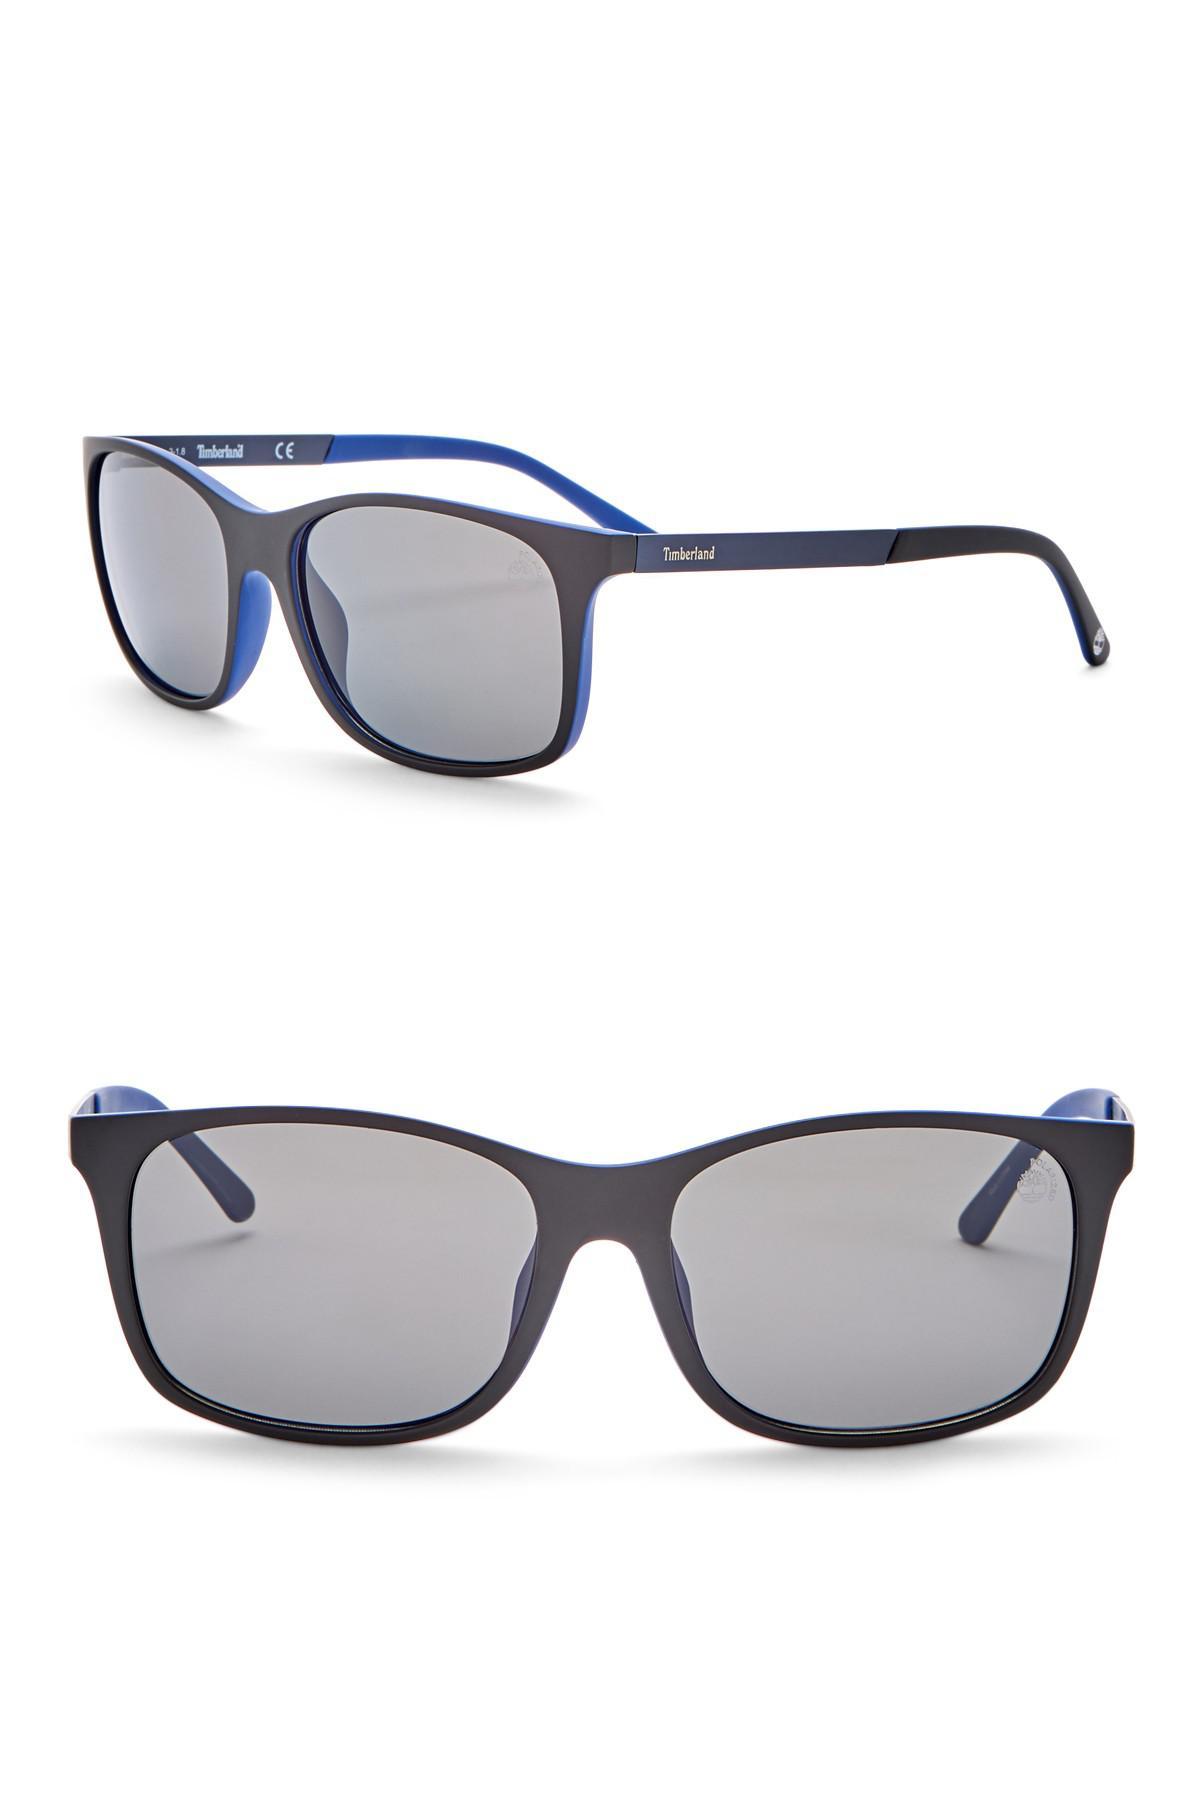 8941df77e53 Timberland - Multicolor Square 56mm Polarized Sunglasses for Men - Lyst.  View fullscreen